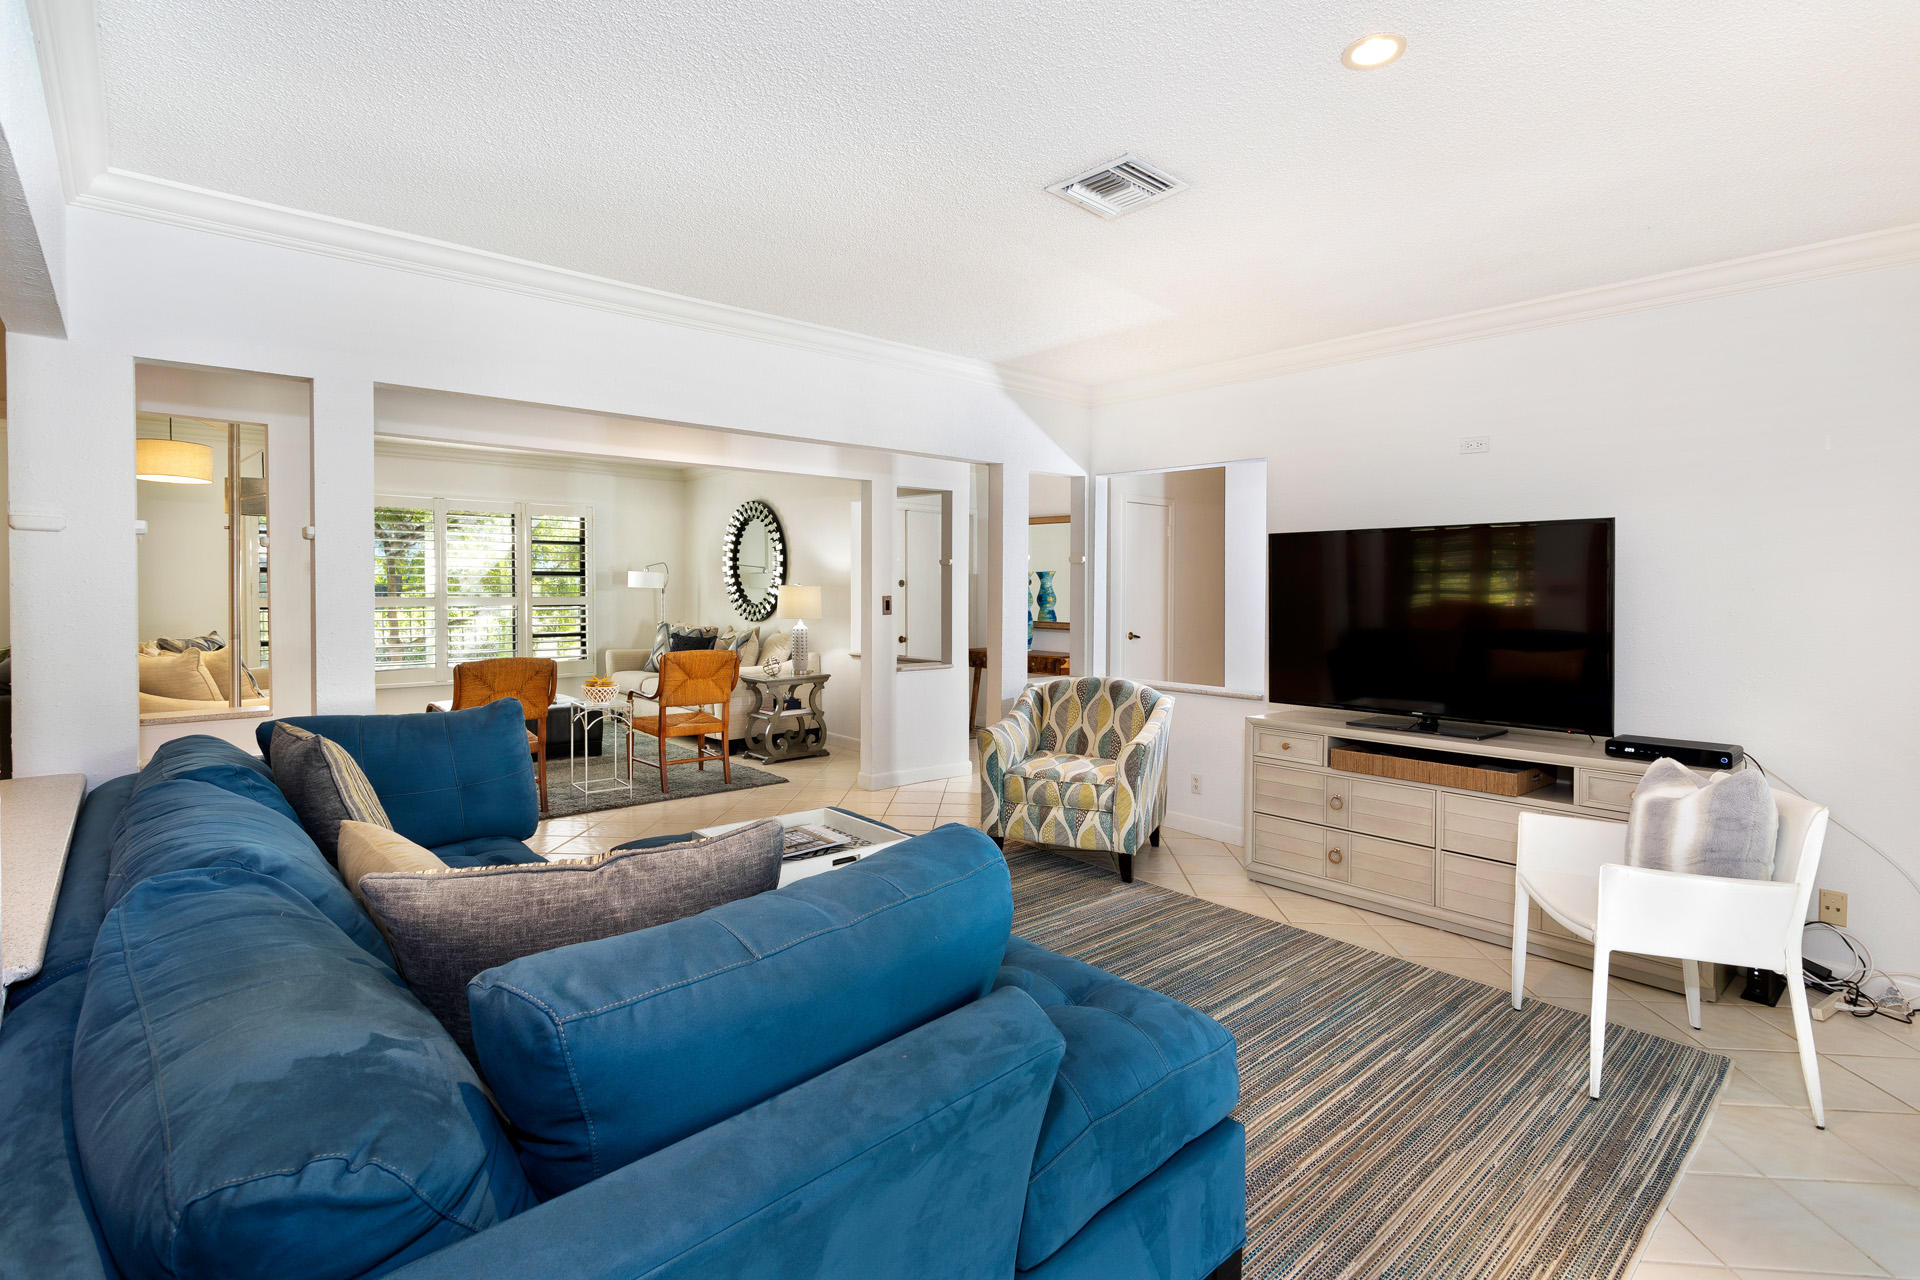 1153 Harbor Drive, Delray Beach, Florida 33483, 5 Bedrooms Bedrooms, ,5 BathroomsBathrooms,Single Family Detached,For Sale,Harbor,RX-10579547